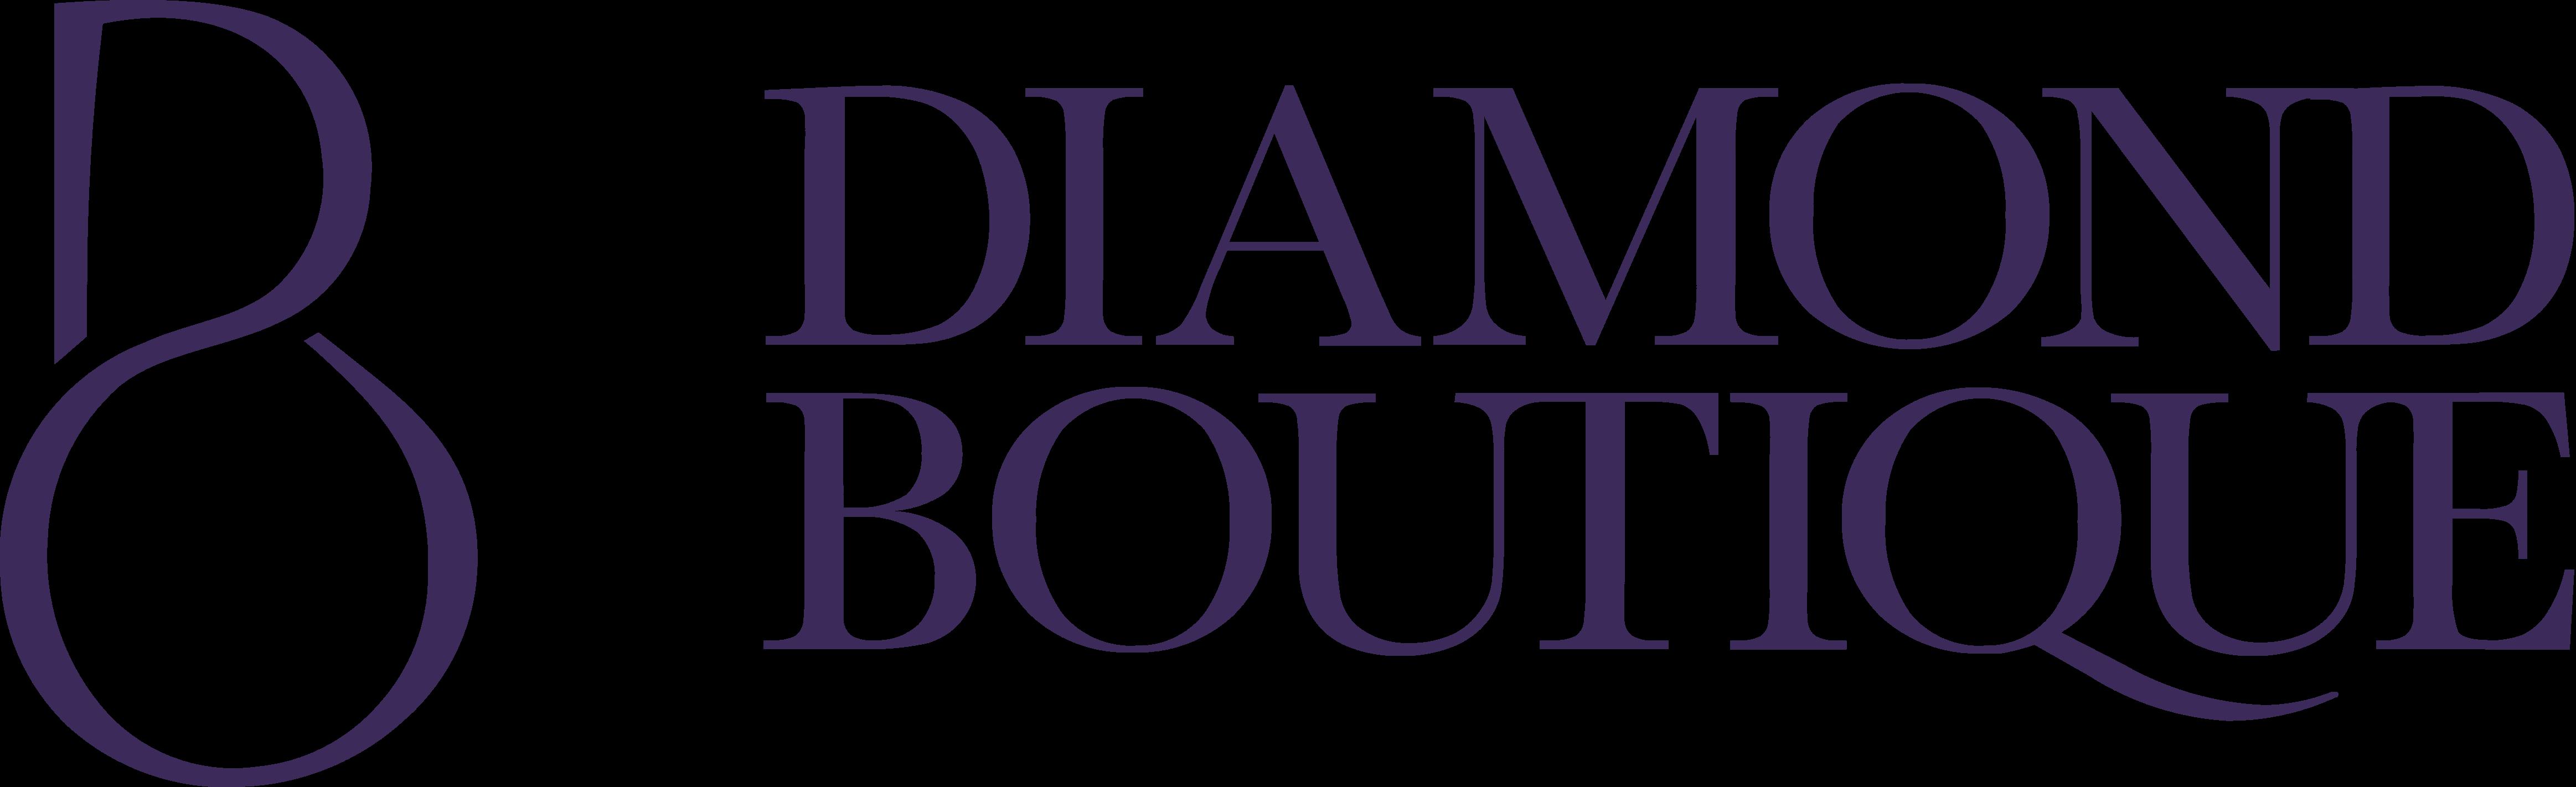 Diamond boutique logos download for Boutique hotel logo